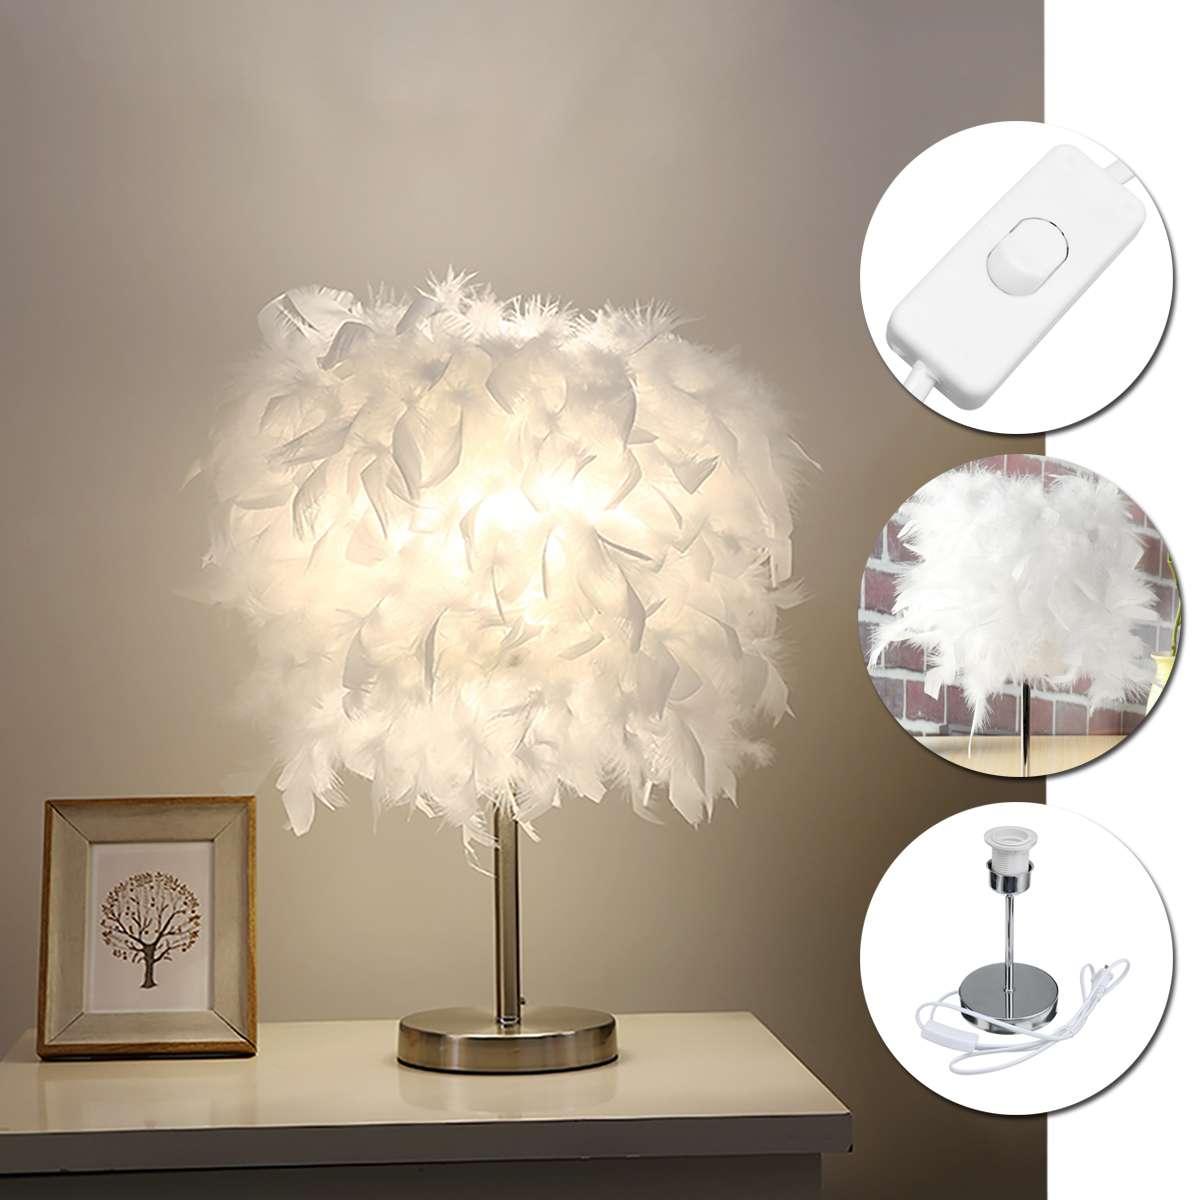 220V Feather Shade Metal Table Lamps Bedside Desk Vintage Night Light Christmas Decor Soft Vintage Bedroom Study Room White